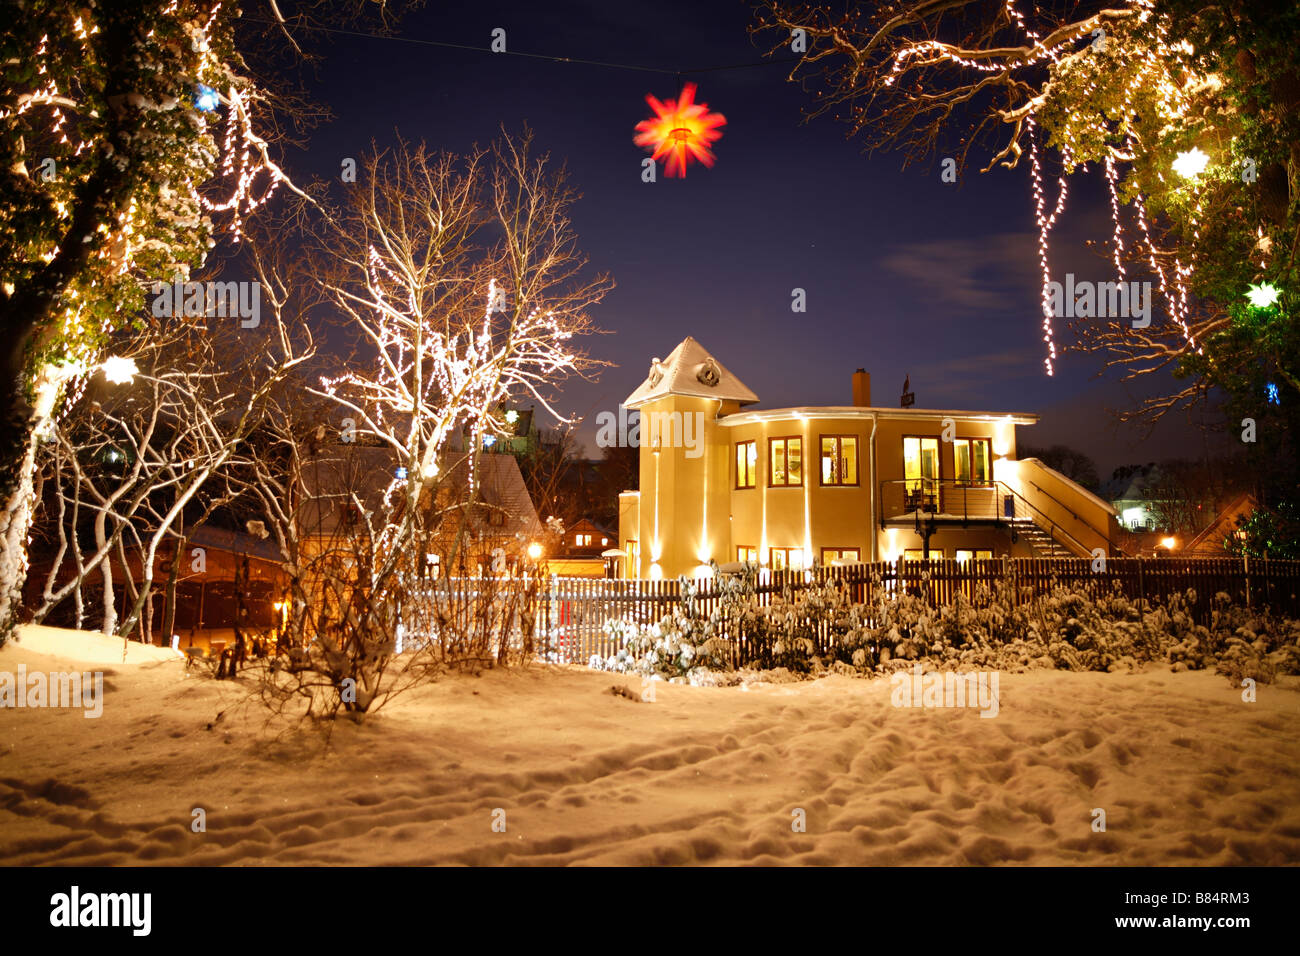 christmas illumination outside of the restaurant Objekt 5 in Halle (Saale), Germany - Stock Image